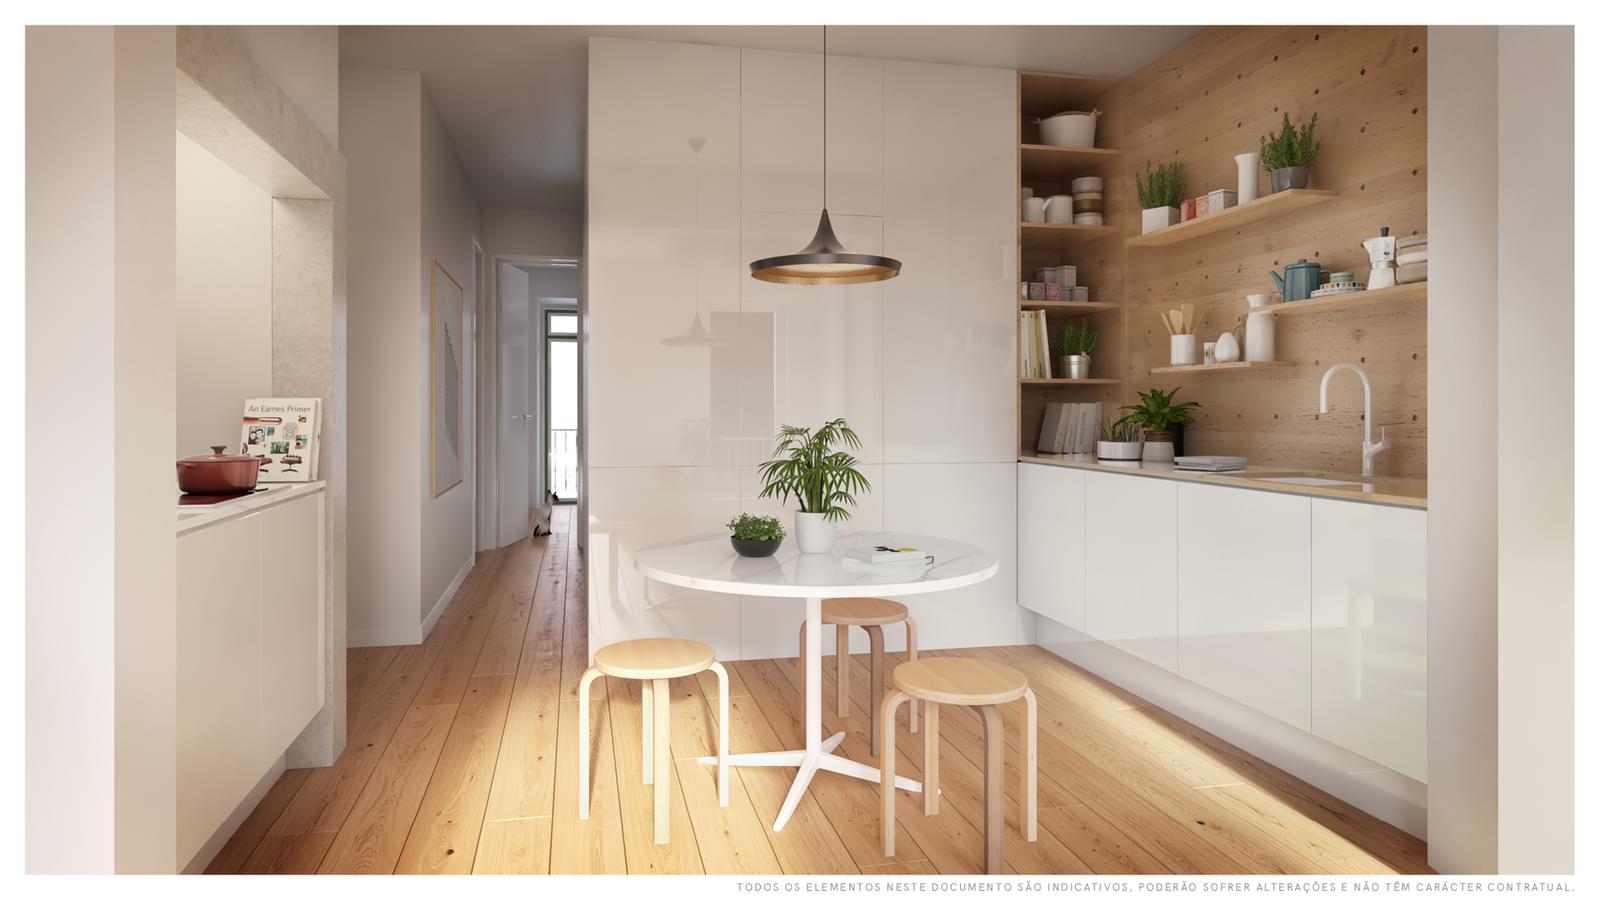 pf17325-apartamento-t3-lisboa-bcb754c1-e279-4a2f-958c-45883e98aea0